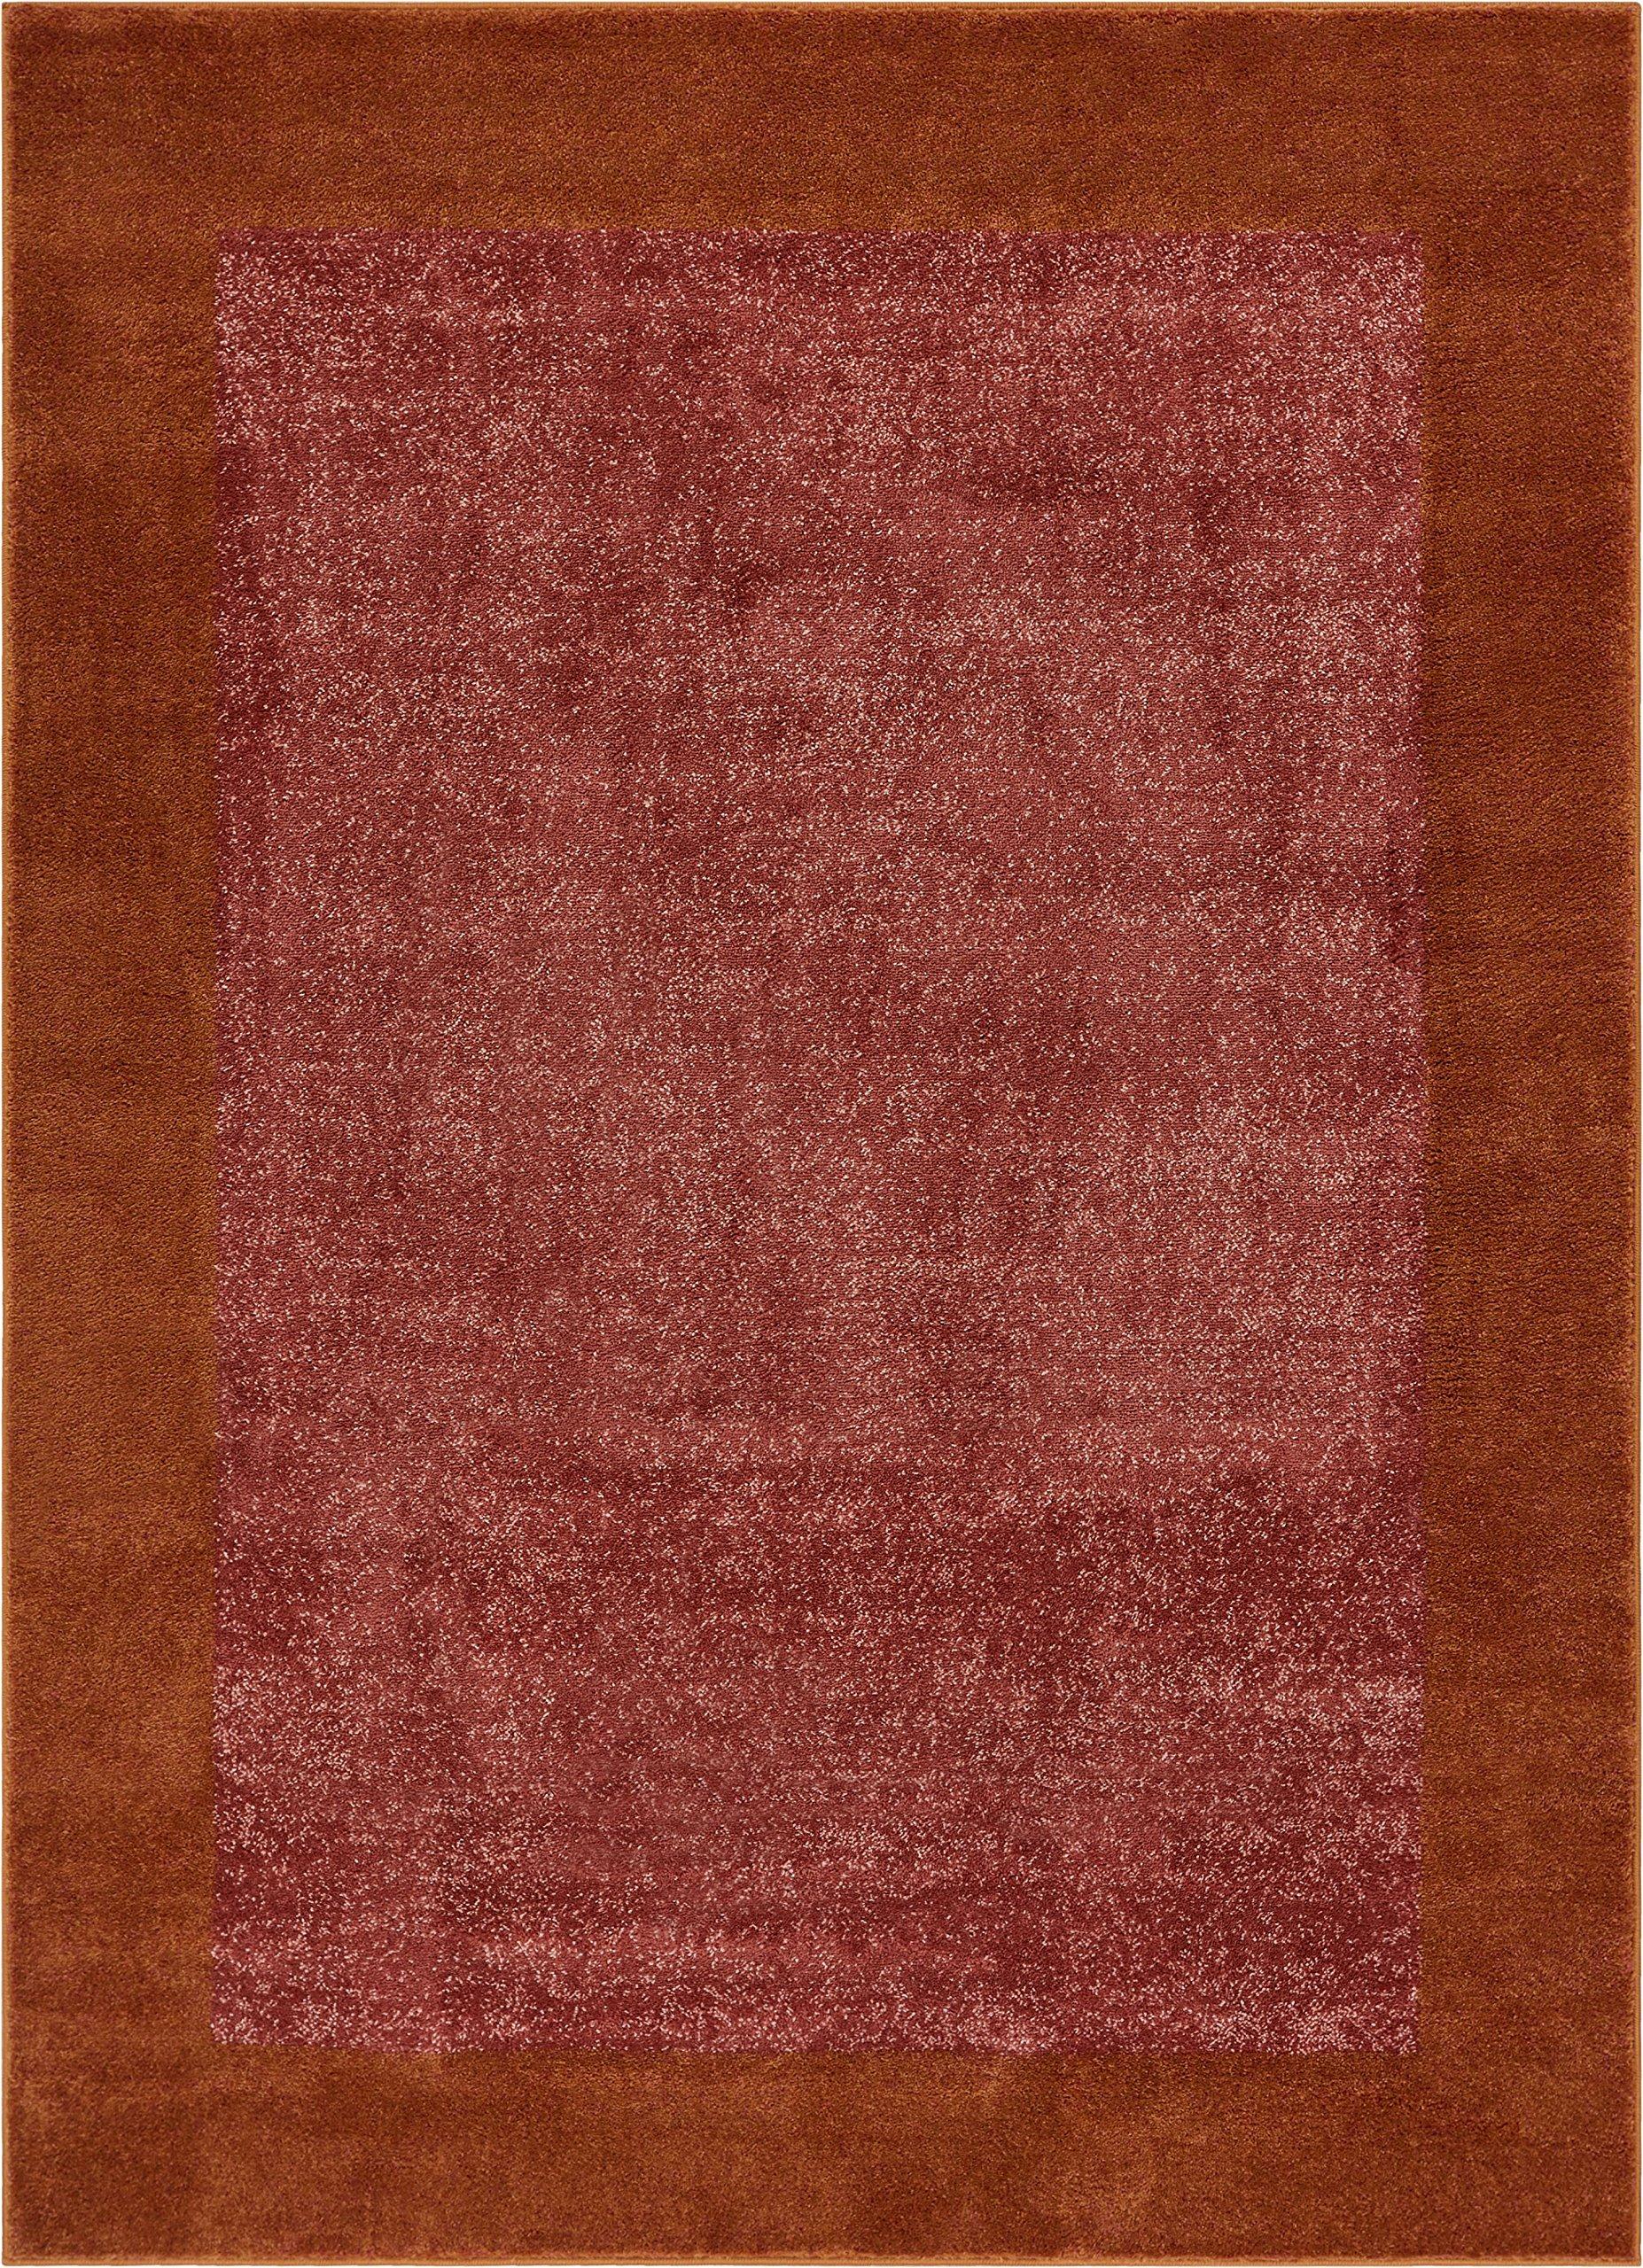 Frontier Border Terracotta Red Geometric Area Rug 8x11 (7'10'' x 10'6'') Plain Field Pattern Soft Plush Carpet